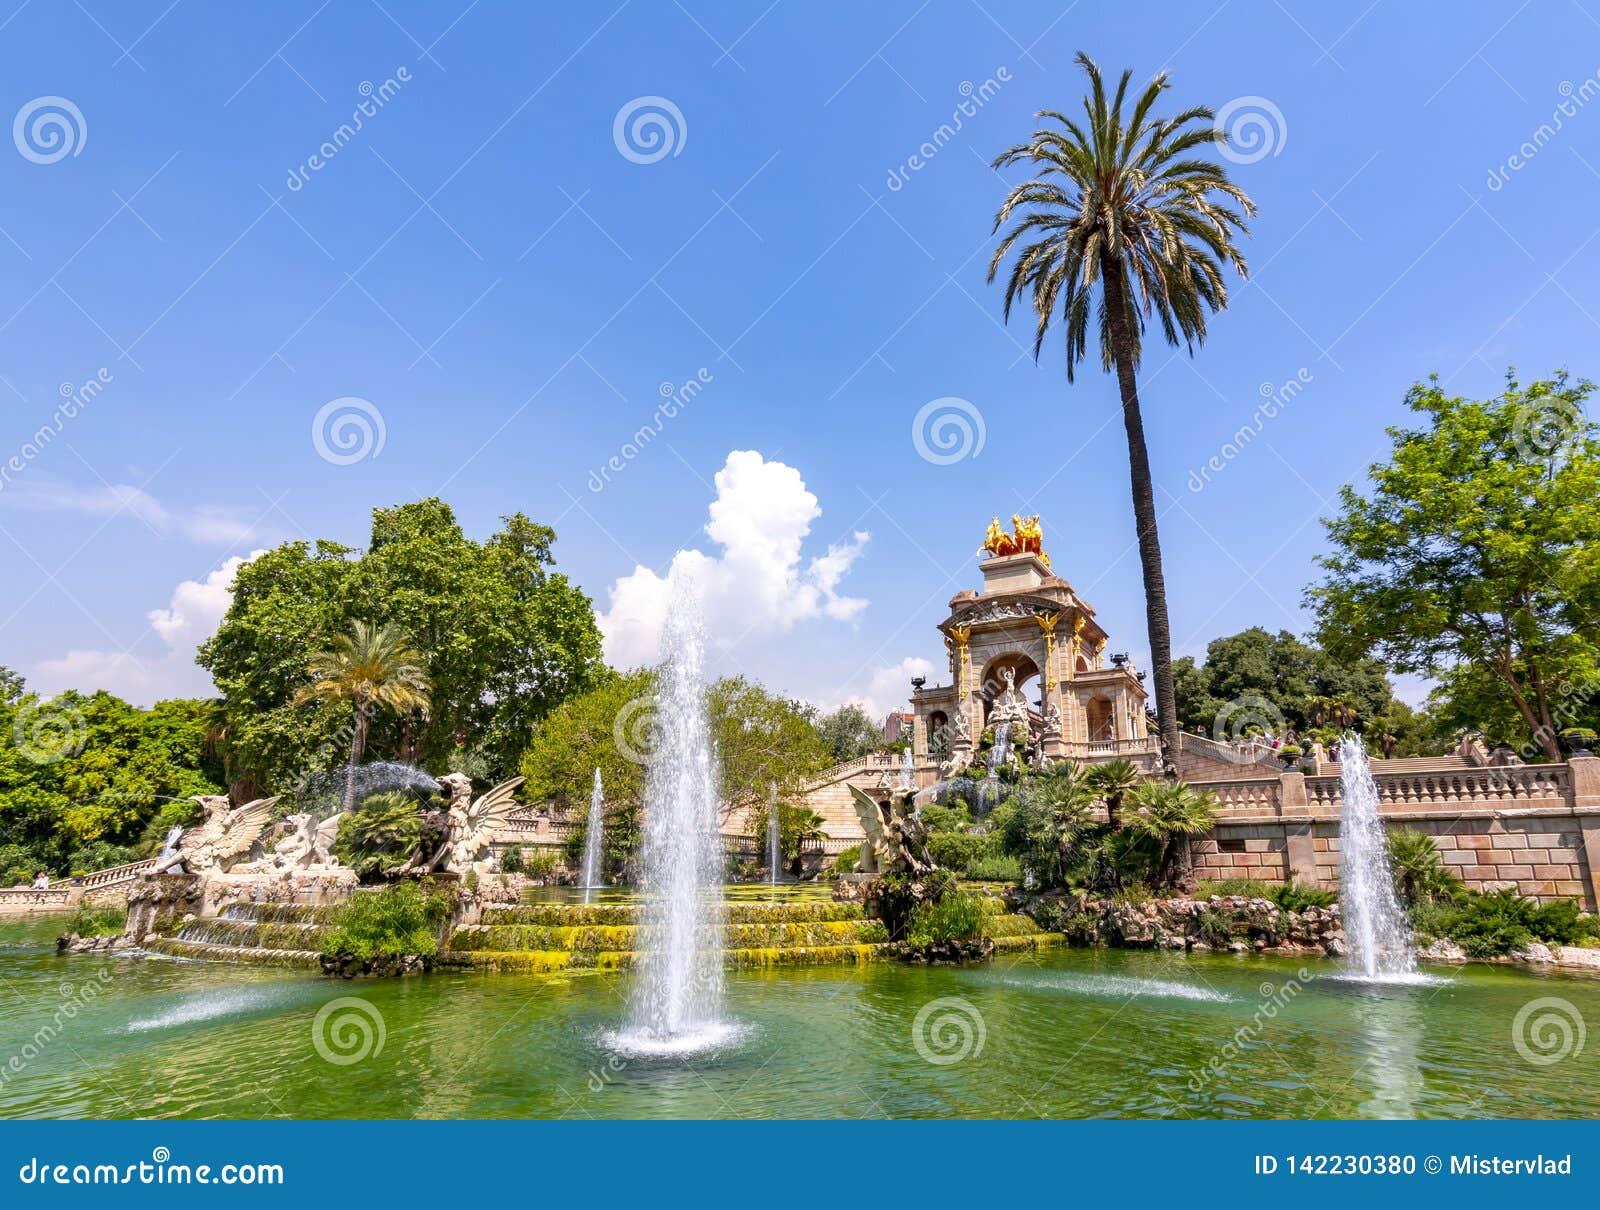 Cascade fountain in Ciutadella park, Barcelona, Spain